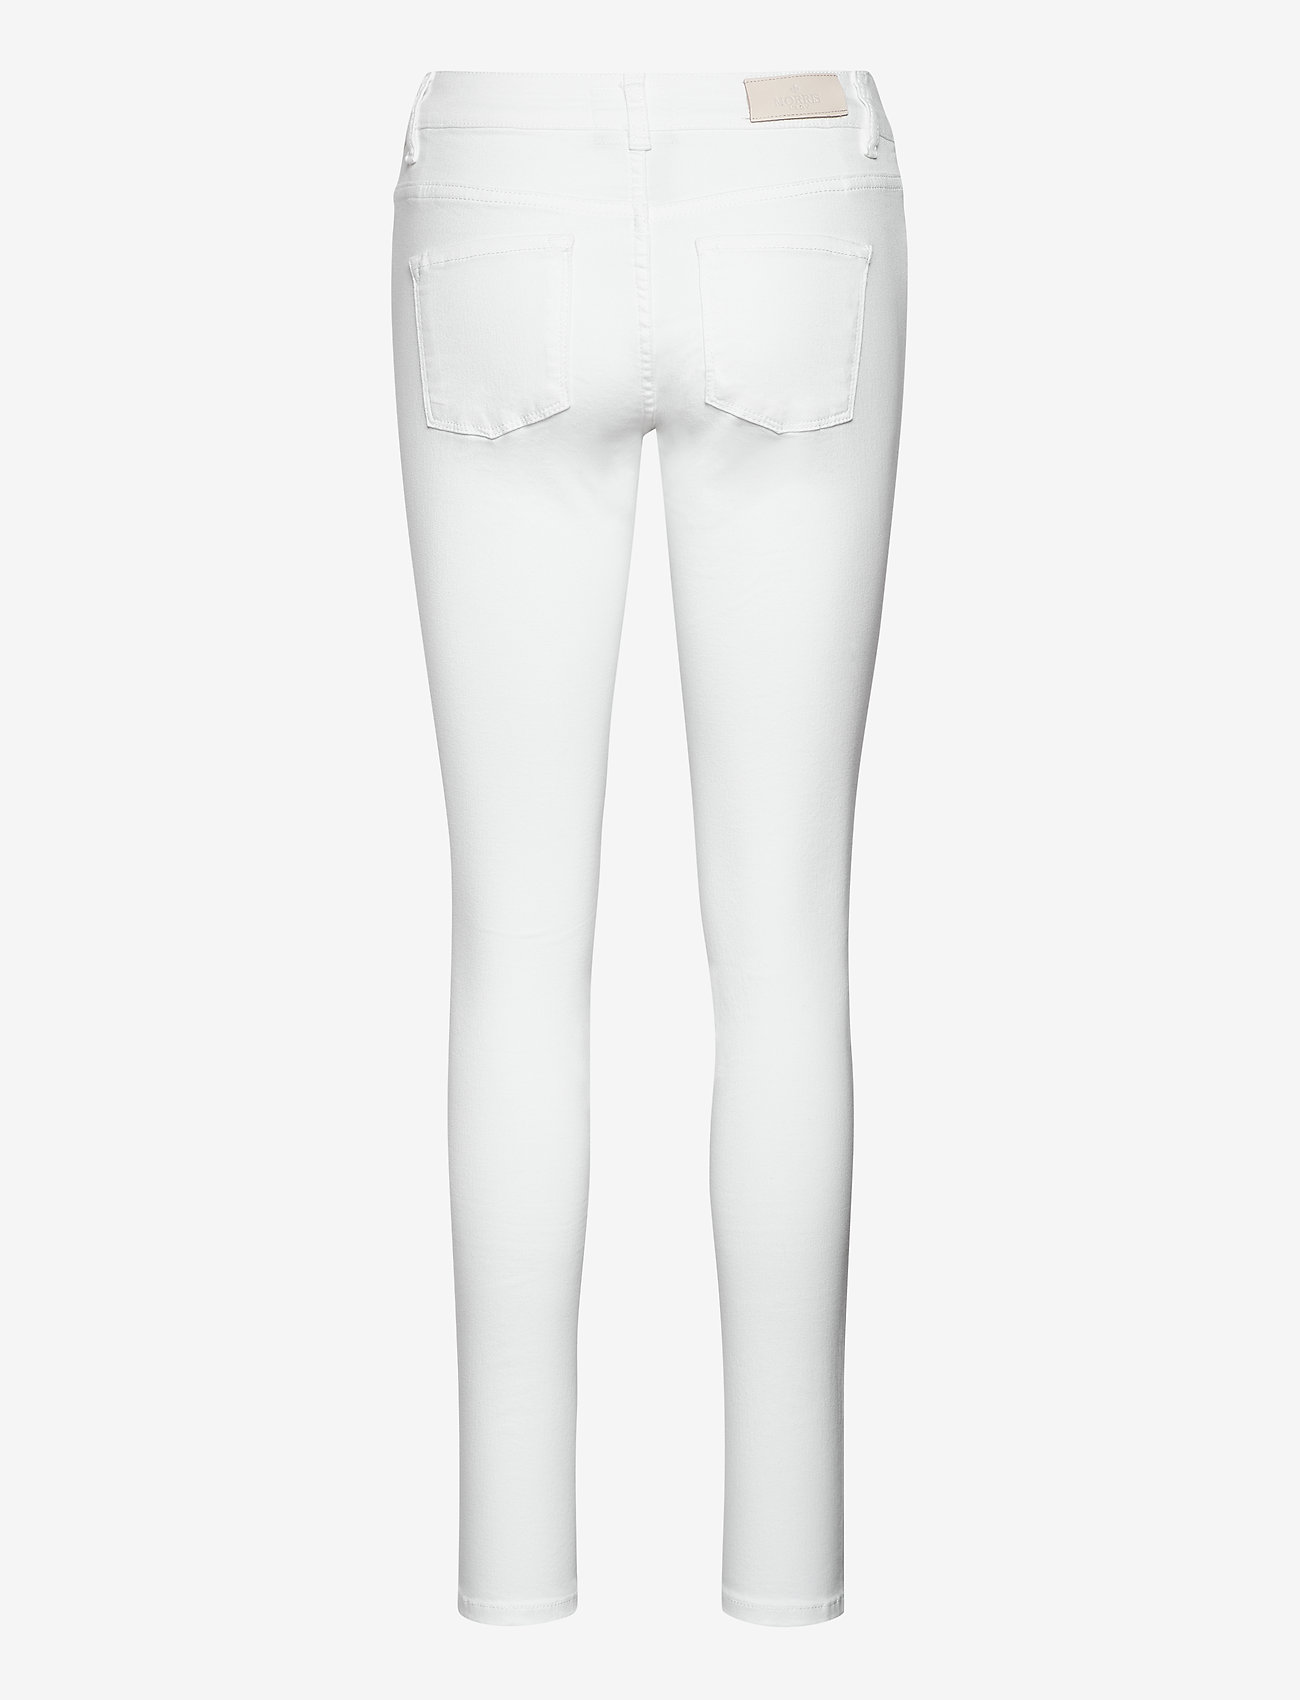 Morris Lady - Monroe Jeans - slim jeans - white - 1